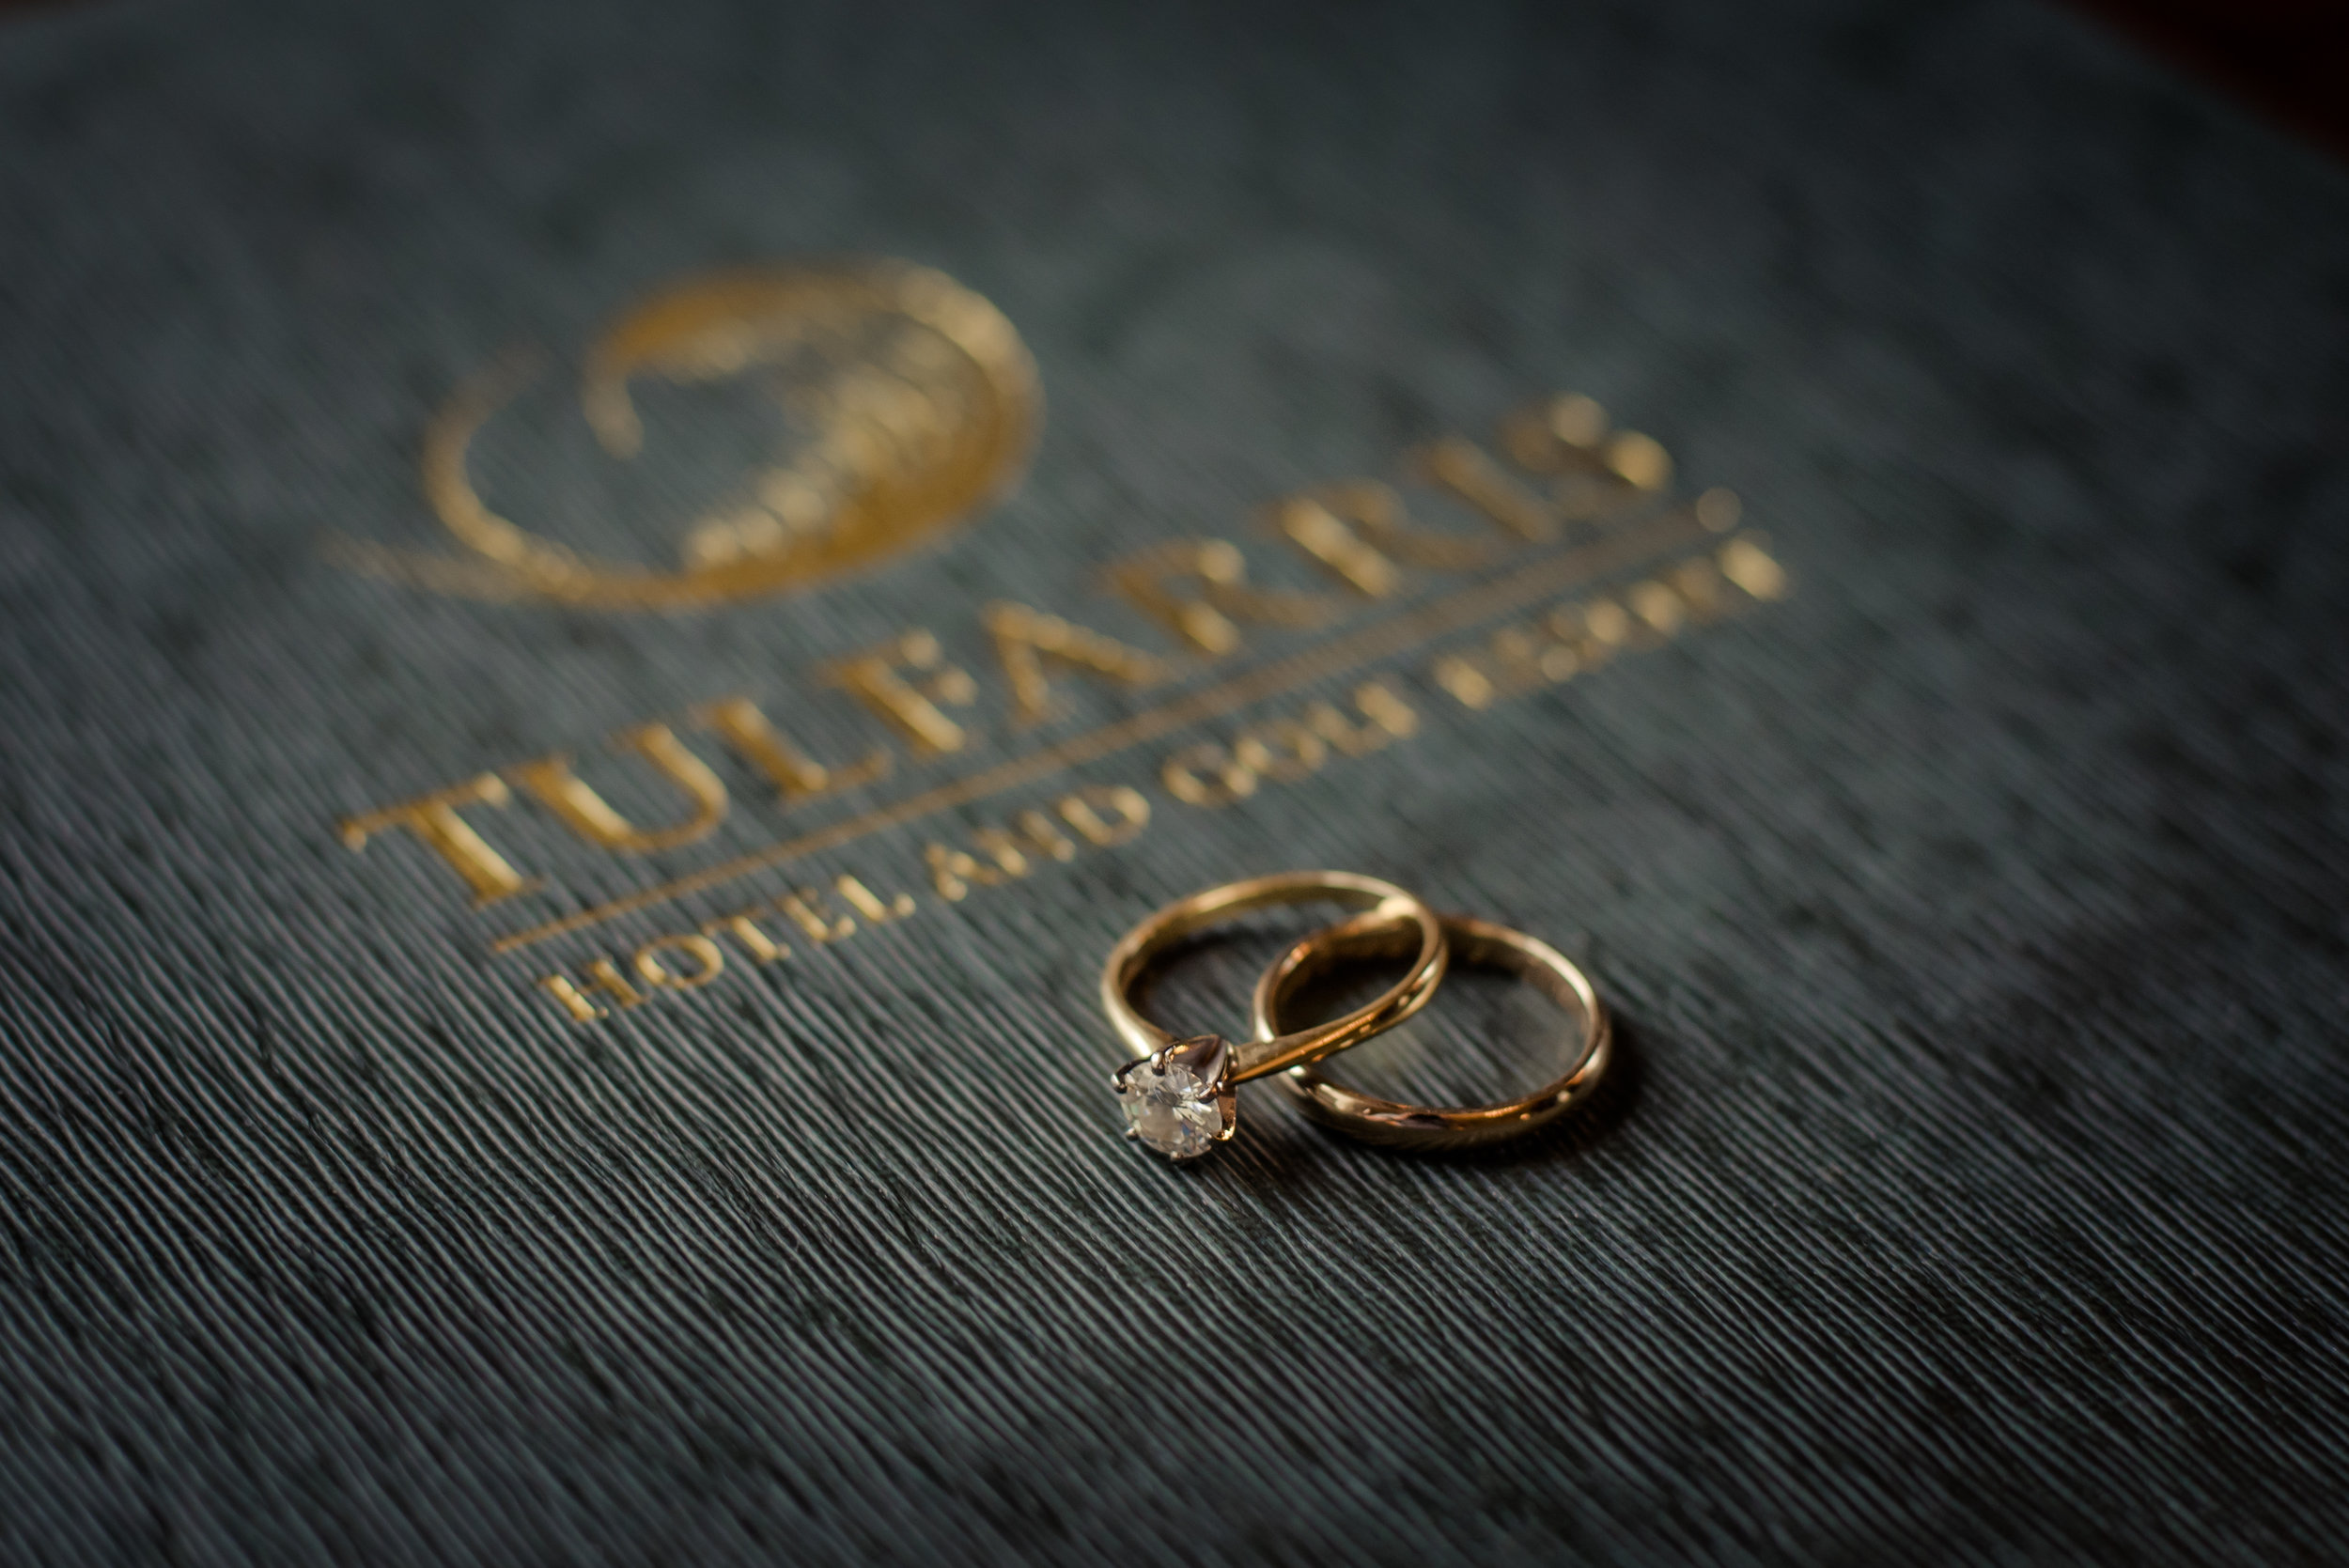 Tulfarris Hotel & Golf Resort wedding rings on bedroom information booklet.jpg